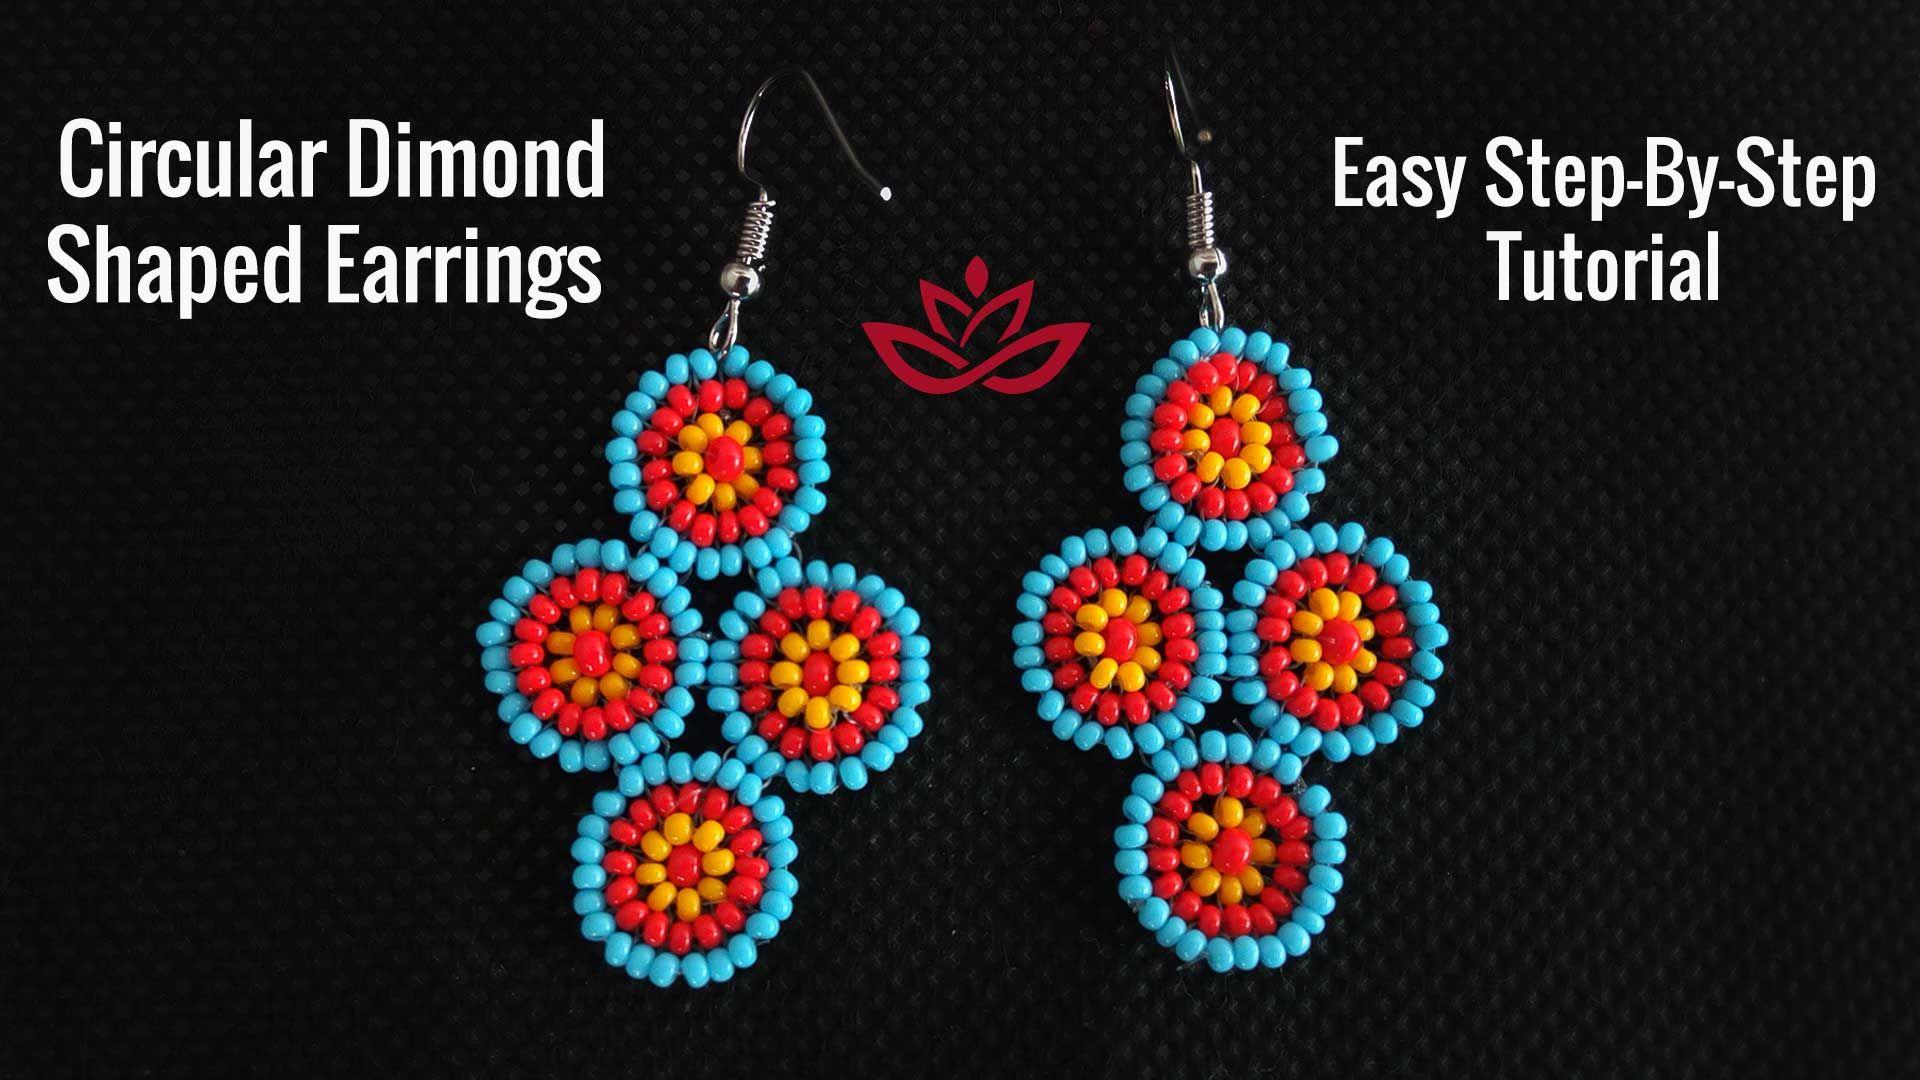 Circular Diamond Shaped Seed Beads Earrings Tutorial How To